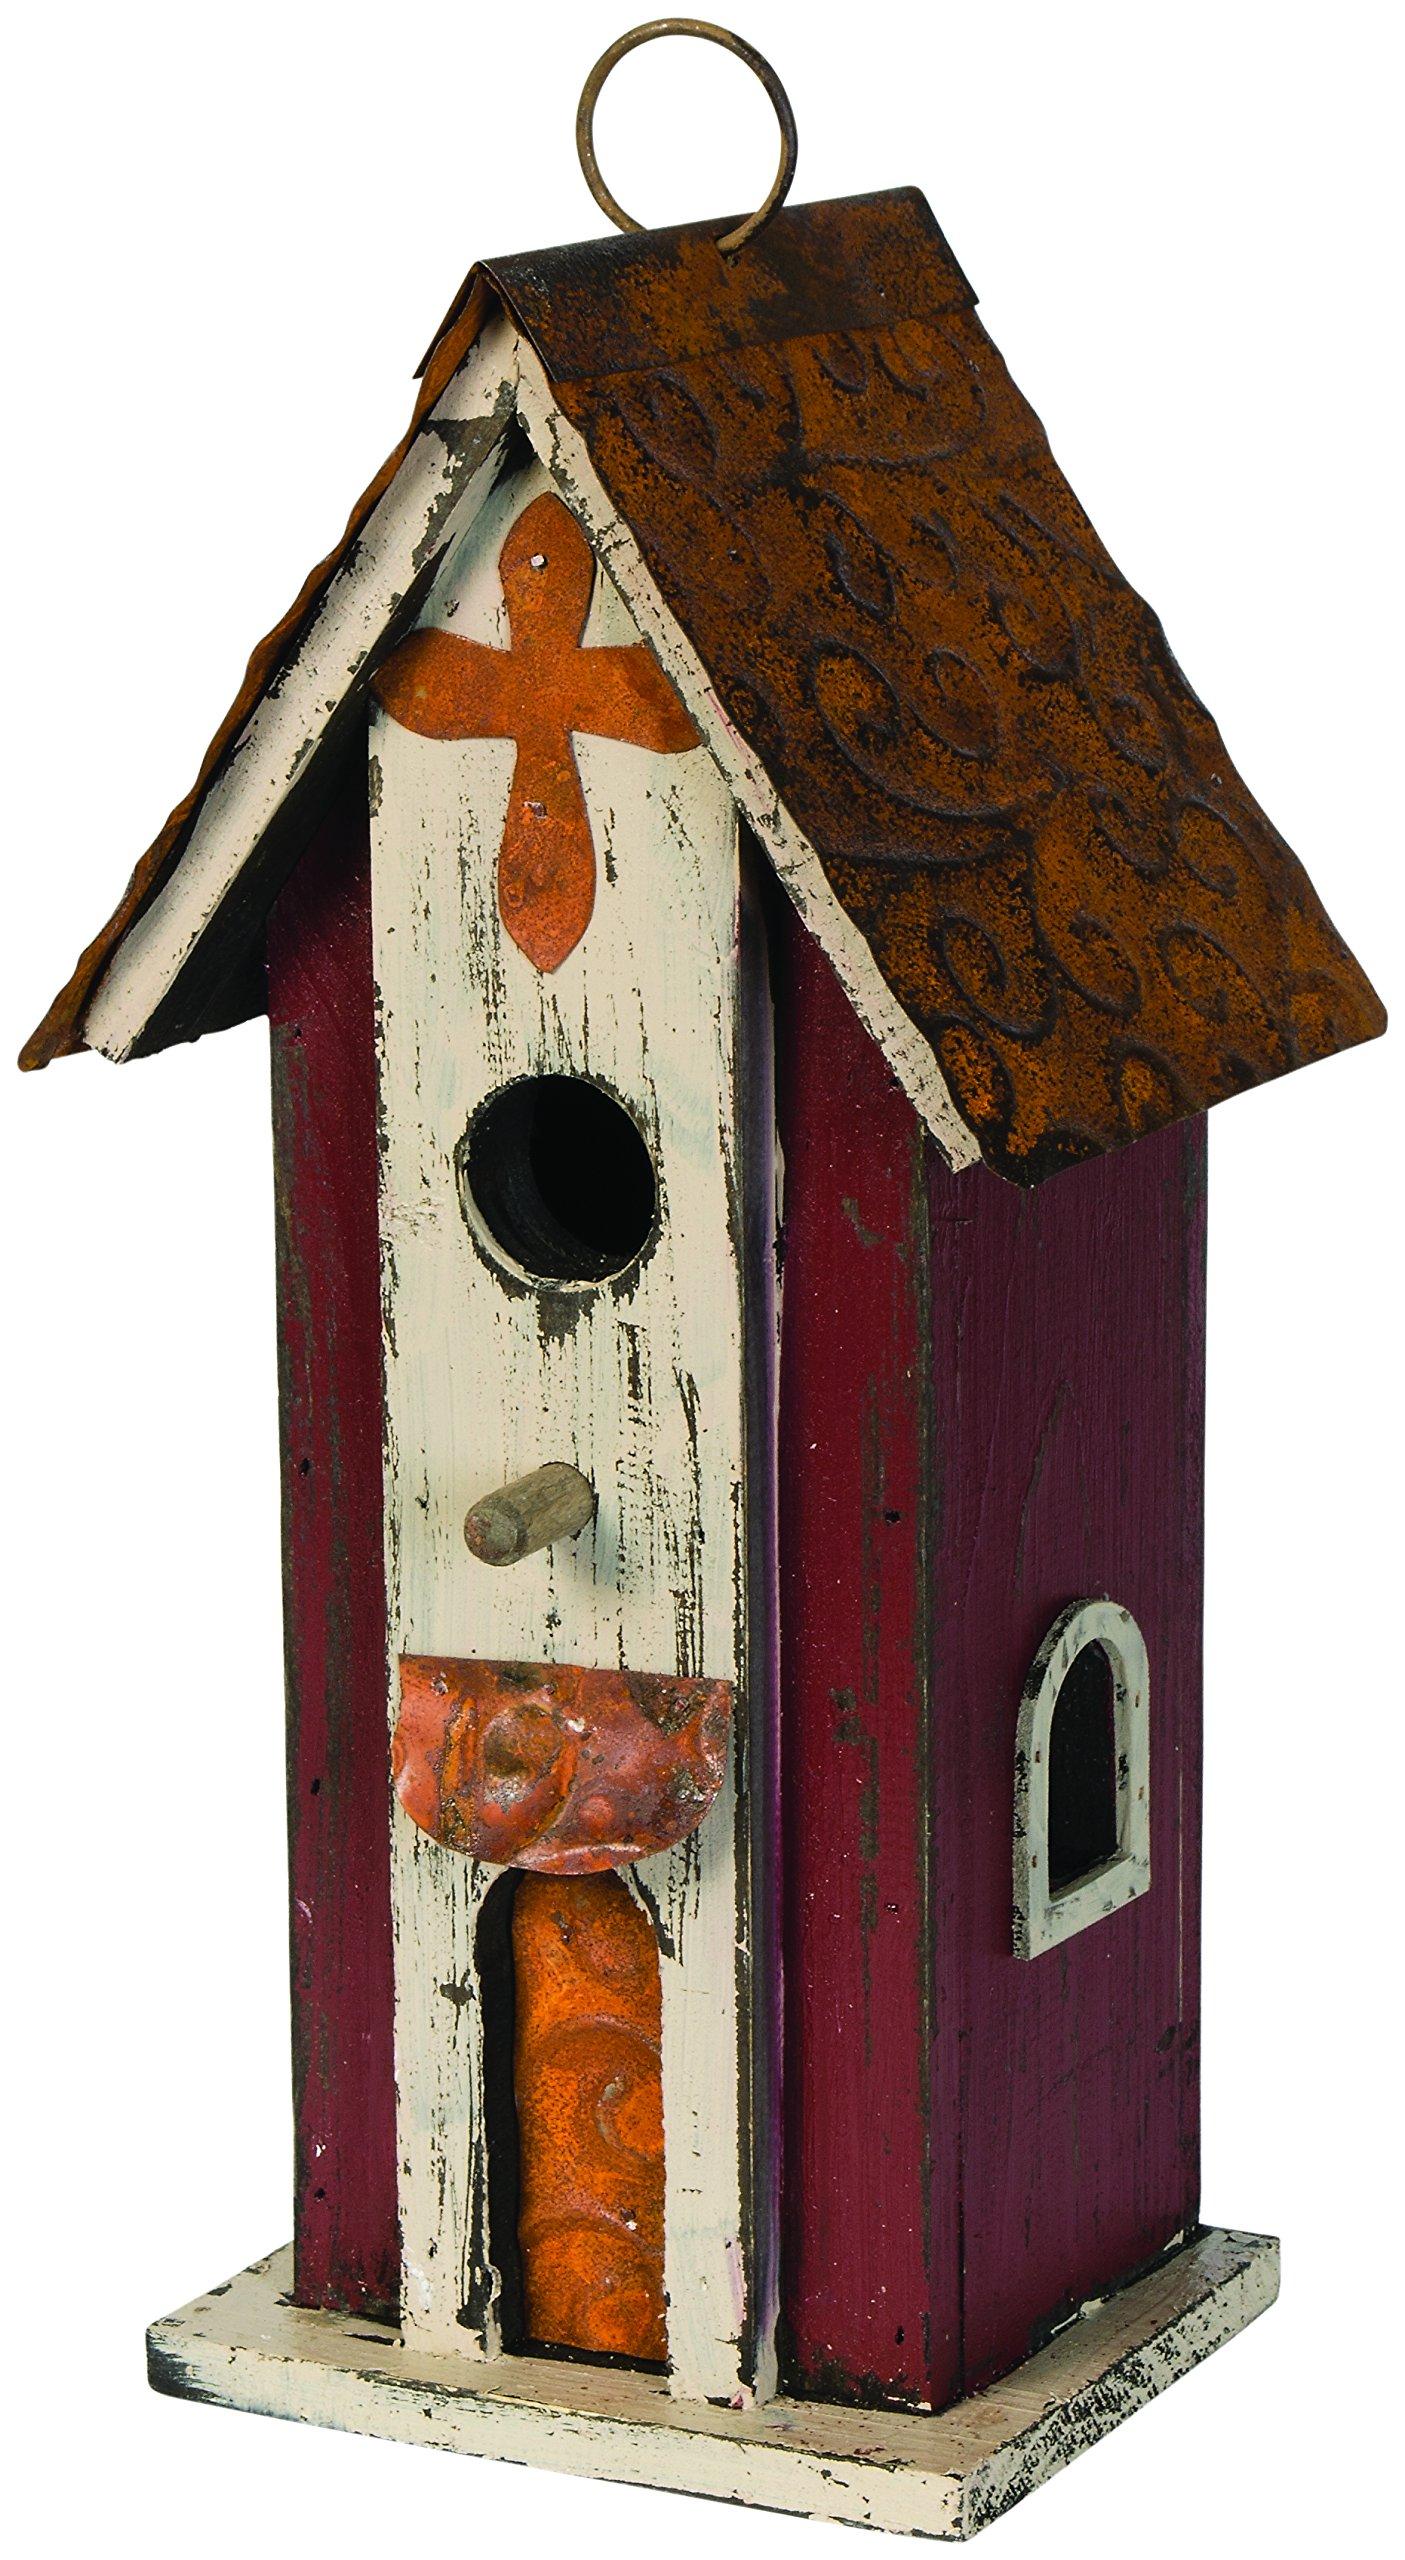 Carson Home Accents Tall Rustic Church Birdhouse